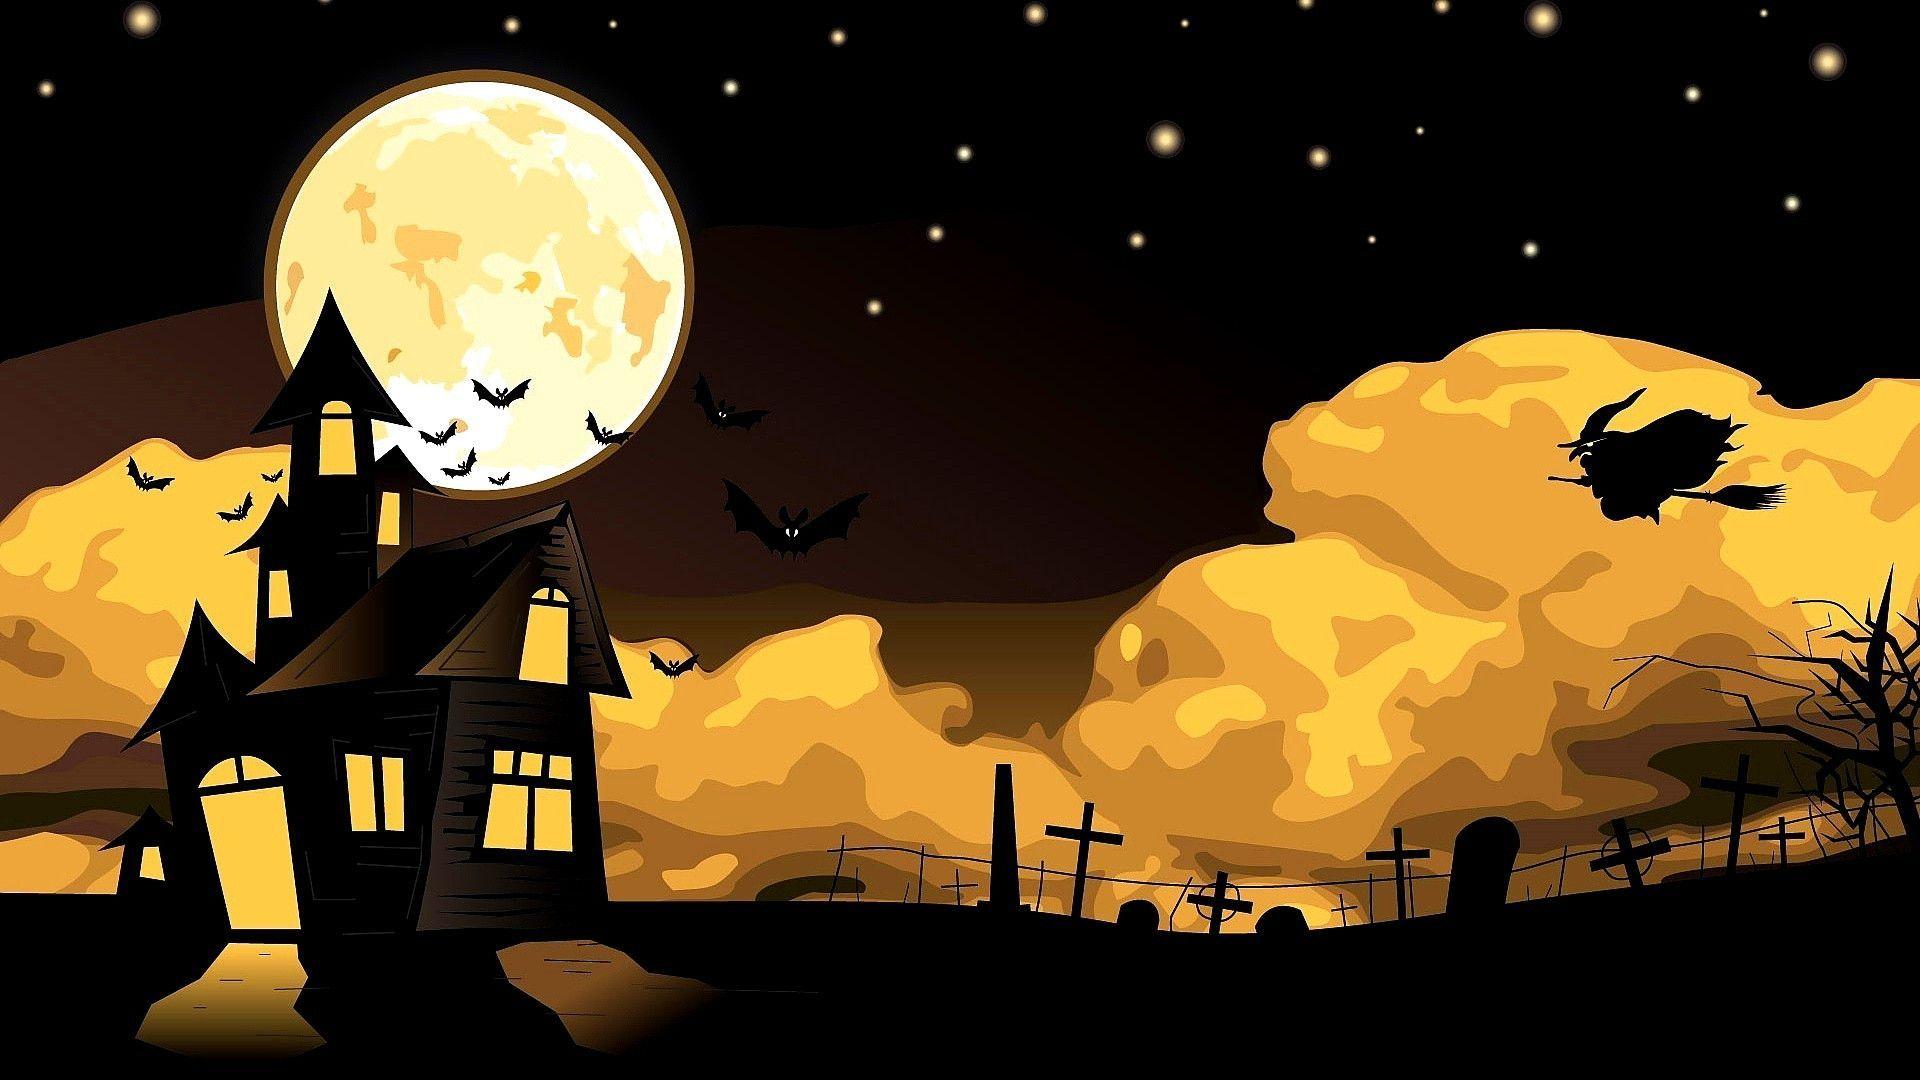 Halloween-1920x1080-HD-Desktop-wallpaper-wp3806152